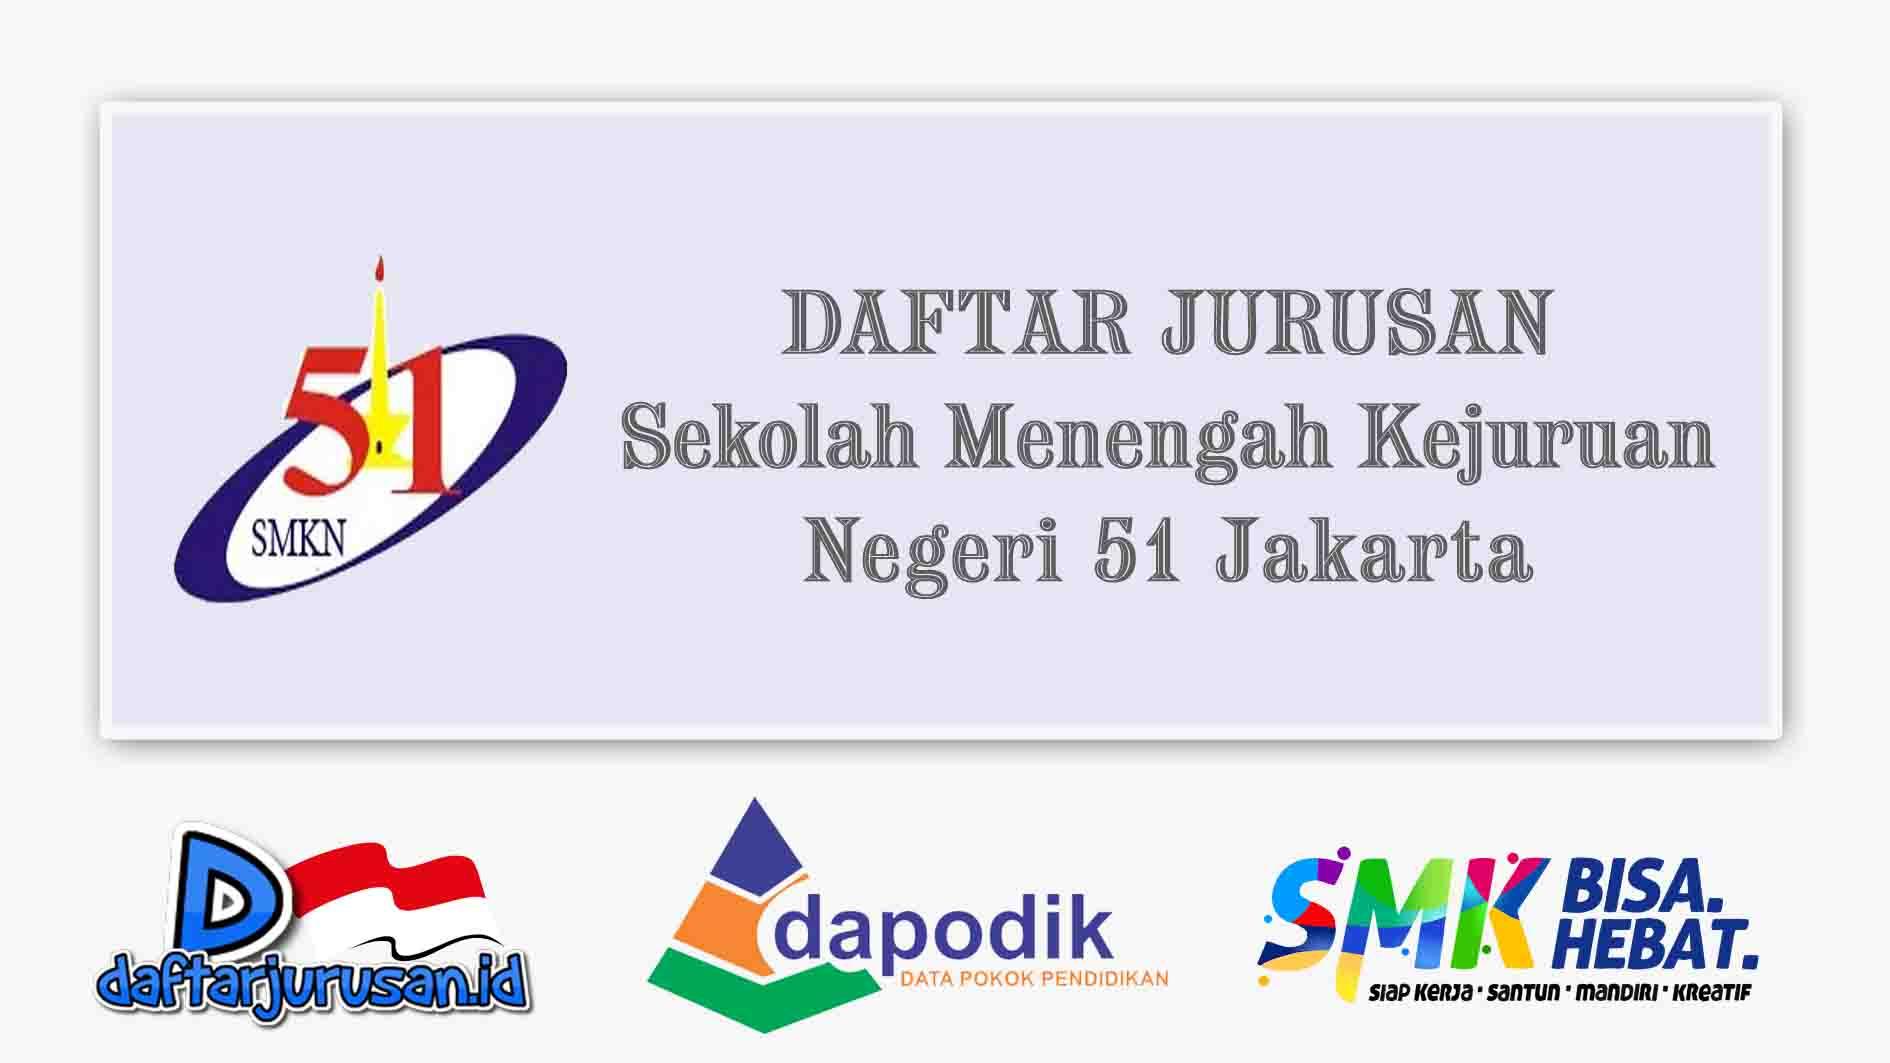 Daftar Jurusan SMK Negeri 51 Jakarta Timur